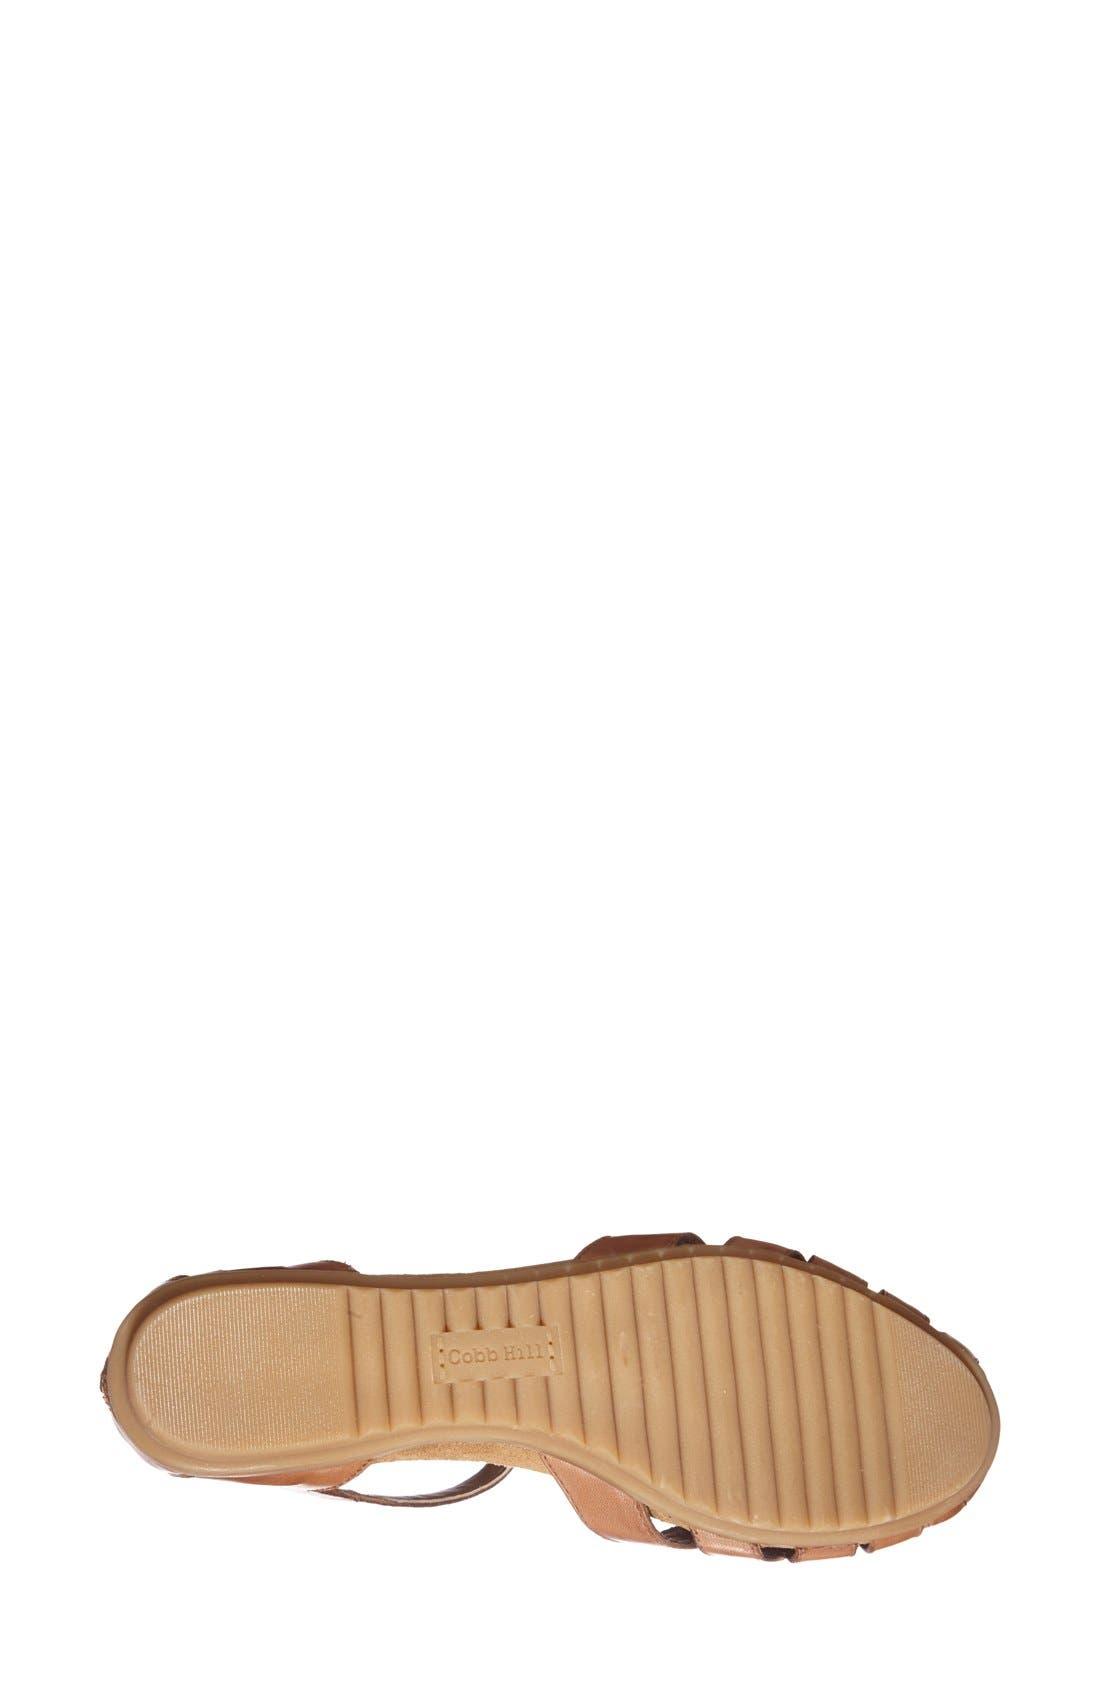 'Ireland' Leather Sandal,                             Alternate thumbnail 6, color,                             TAN